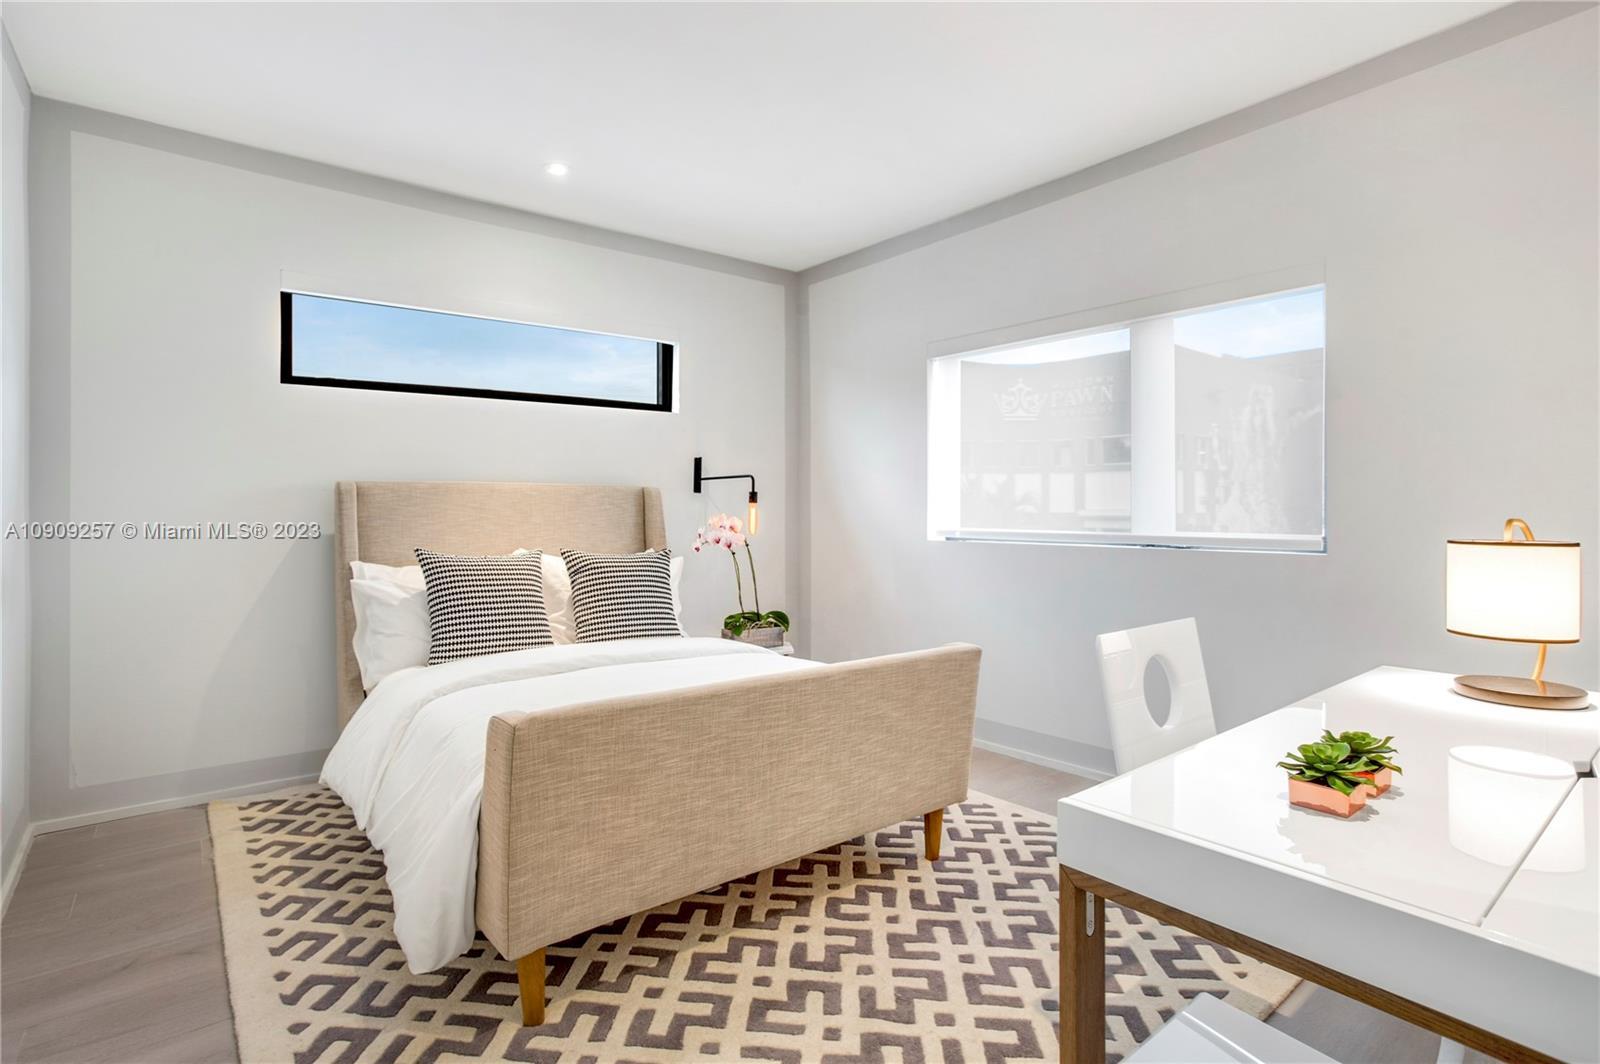 /  2759 sq. ft. $ 2021-03-16 0 Photo